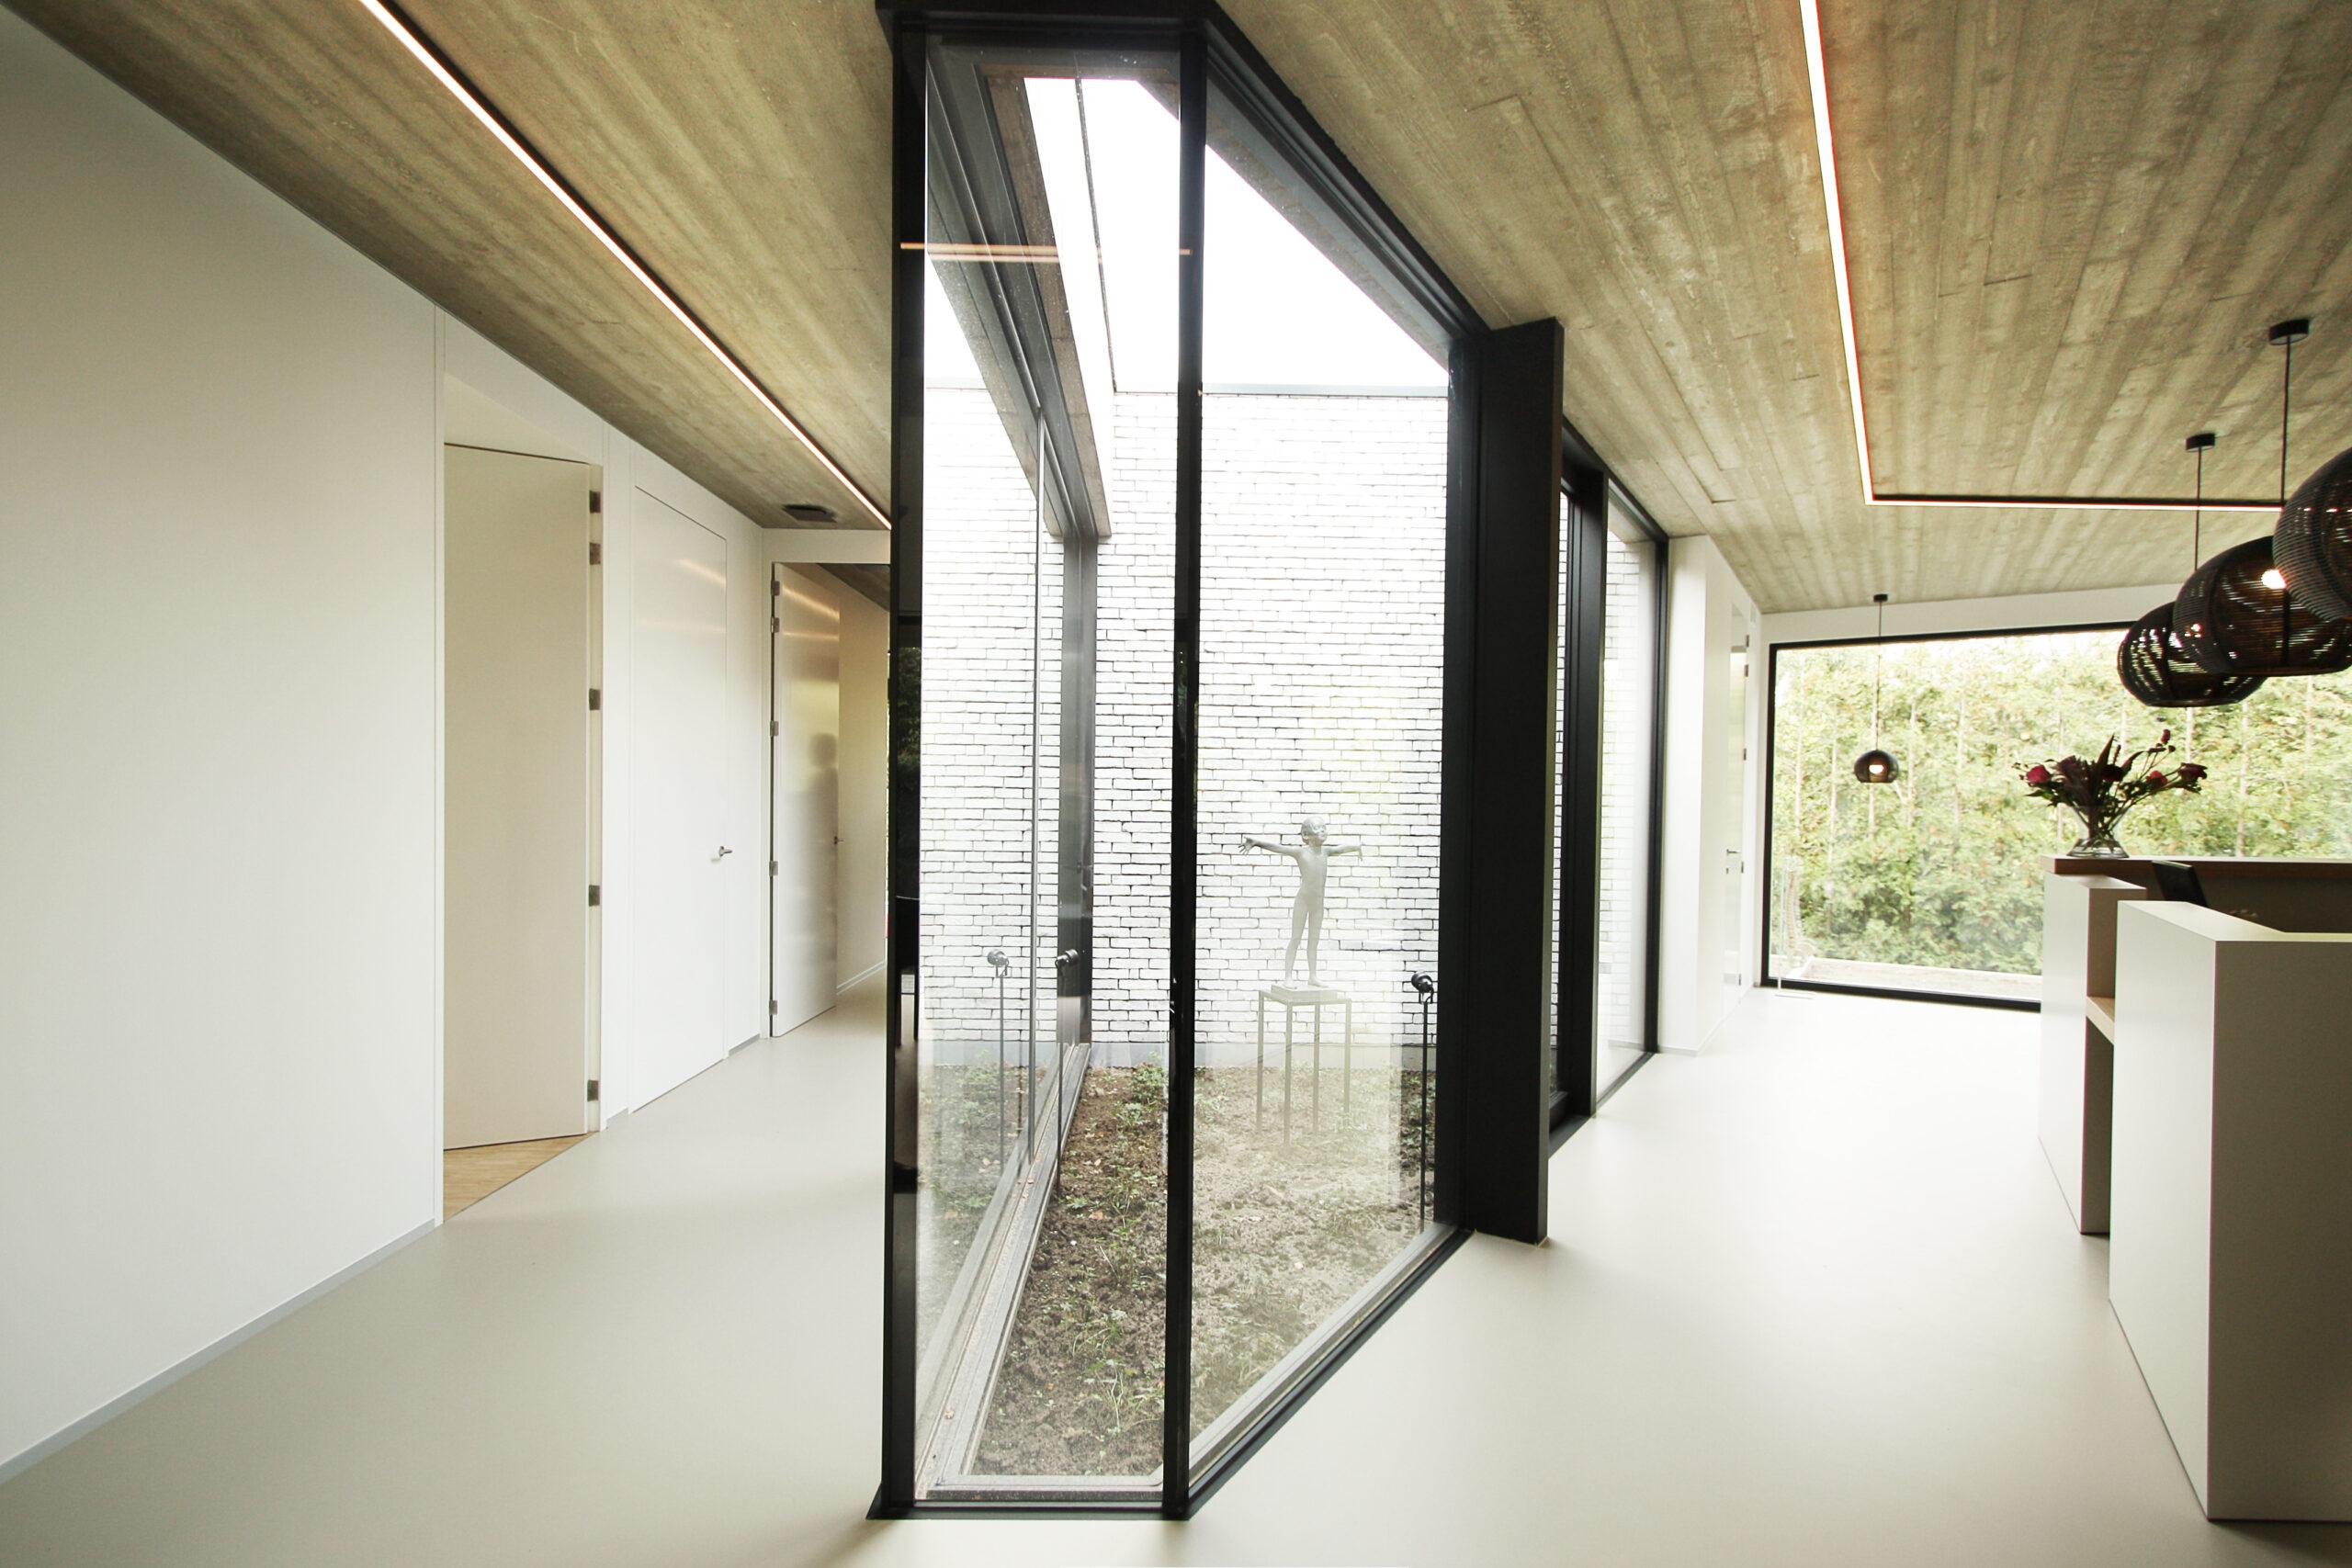 IMG 3466 scaled | Baeyens & Beck architecten Gent | architect nieuwbouw renovatie interieur | high end | architectenbureau